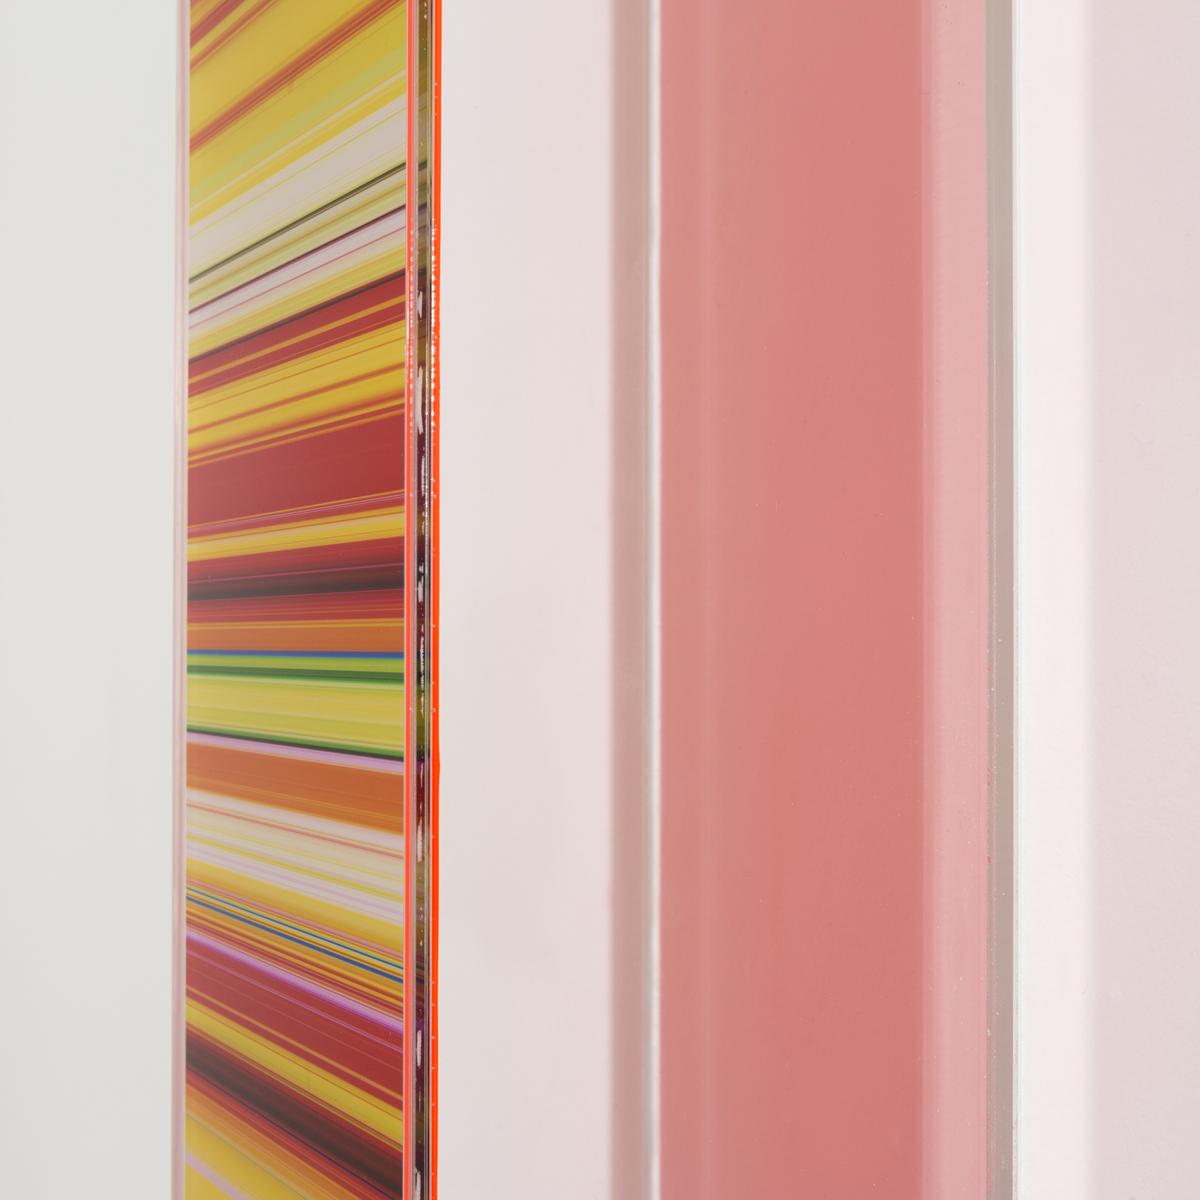 PAUL SNELL  Lumina # 201601  (detail) Lambda print face-mounted to 4.5mm Plexiglas box 180 × 12 × 12 cm